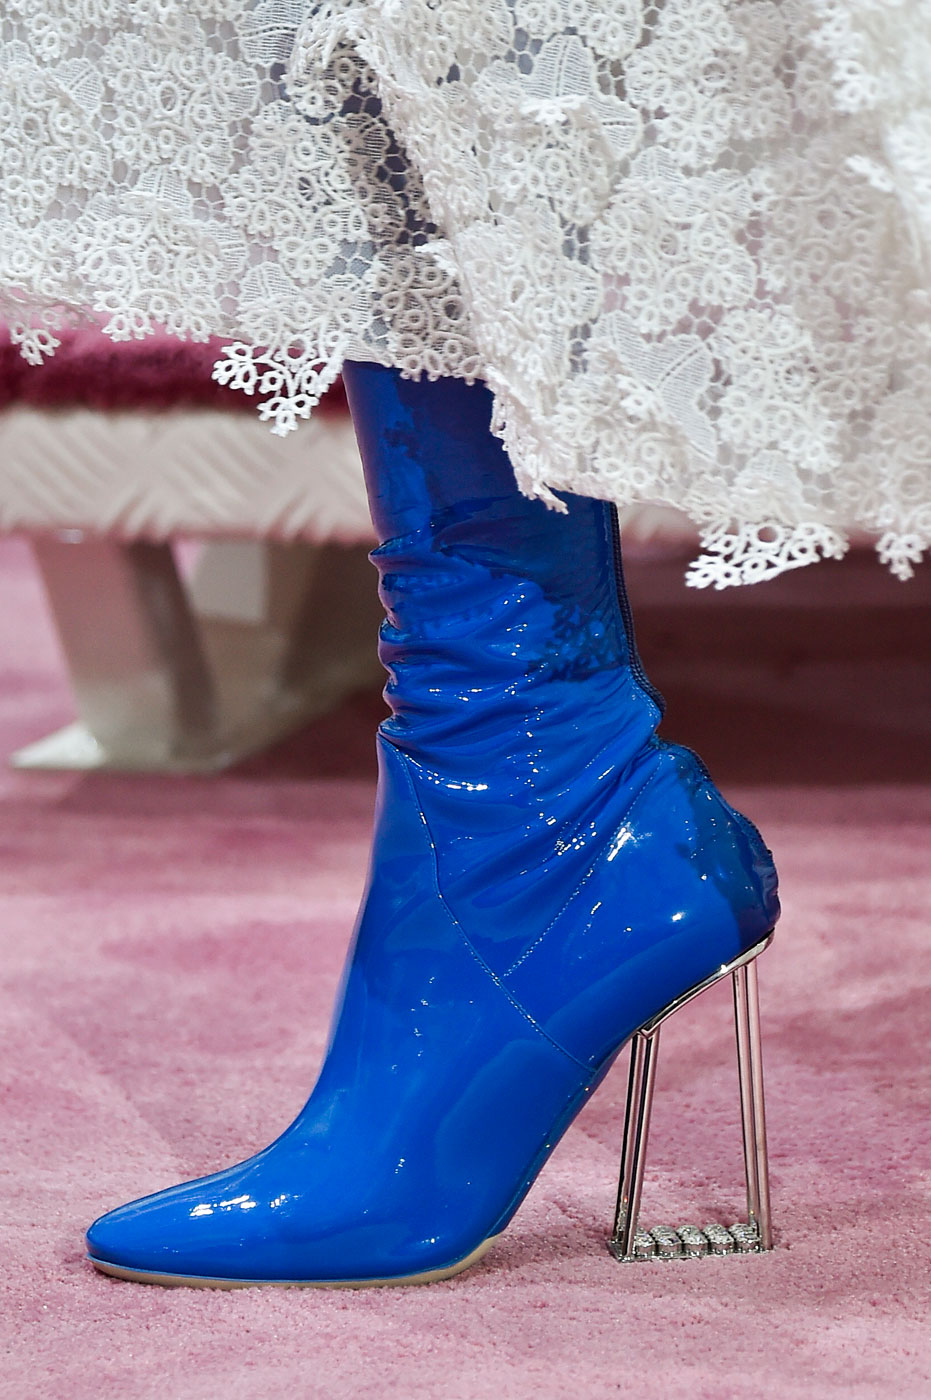 Christian-Dior-fashion-runway-show-close-ups-haute-couture-paris-spring-summer-2015-the-impression-136